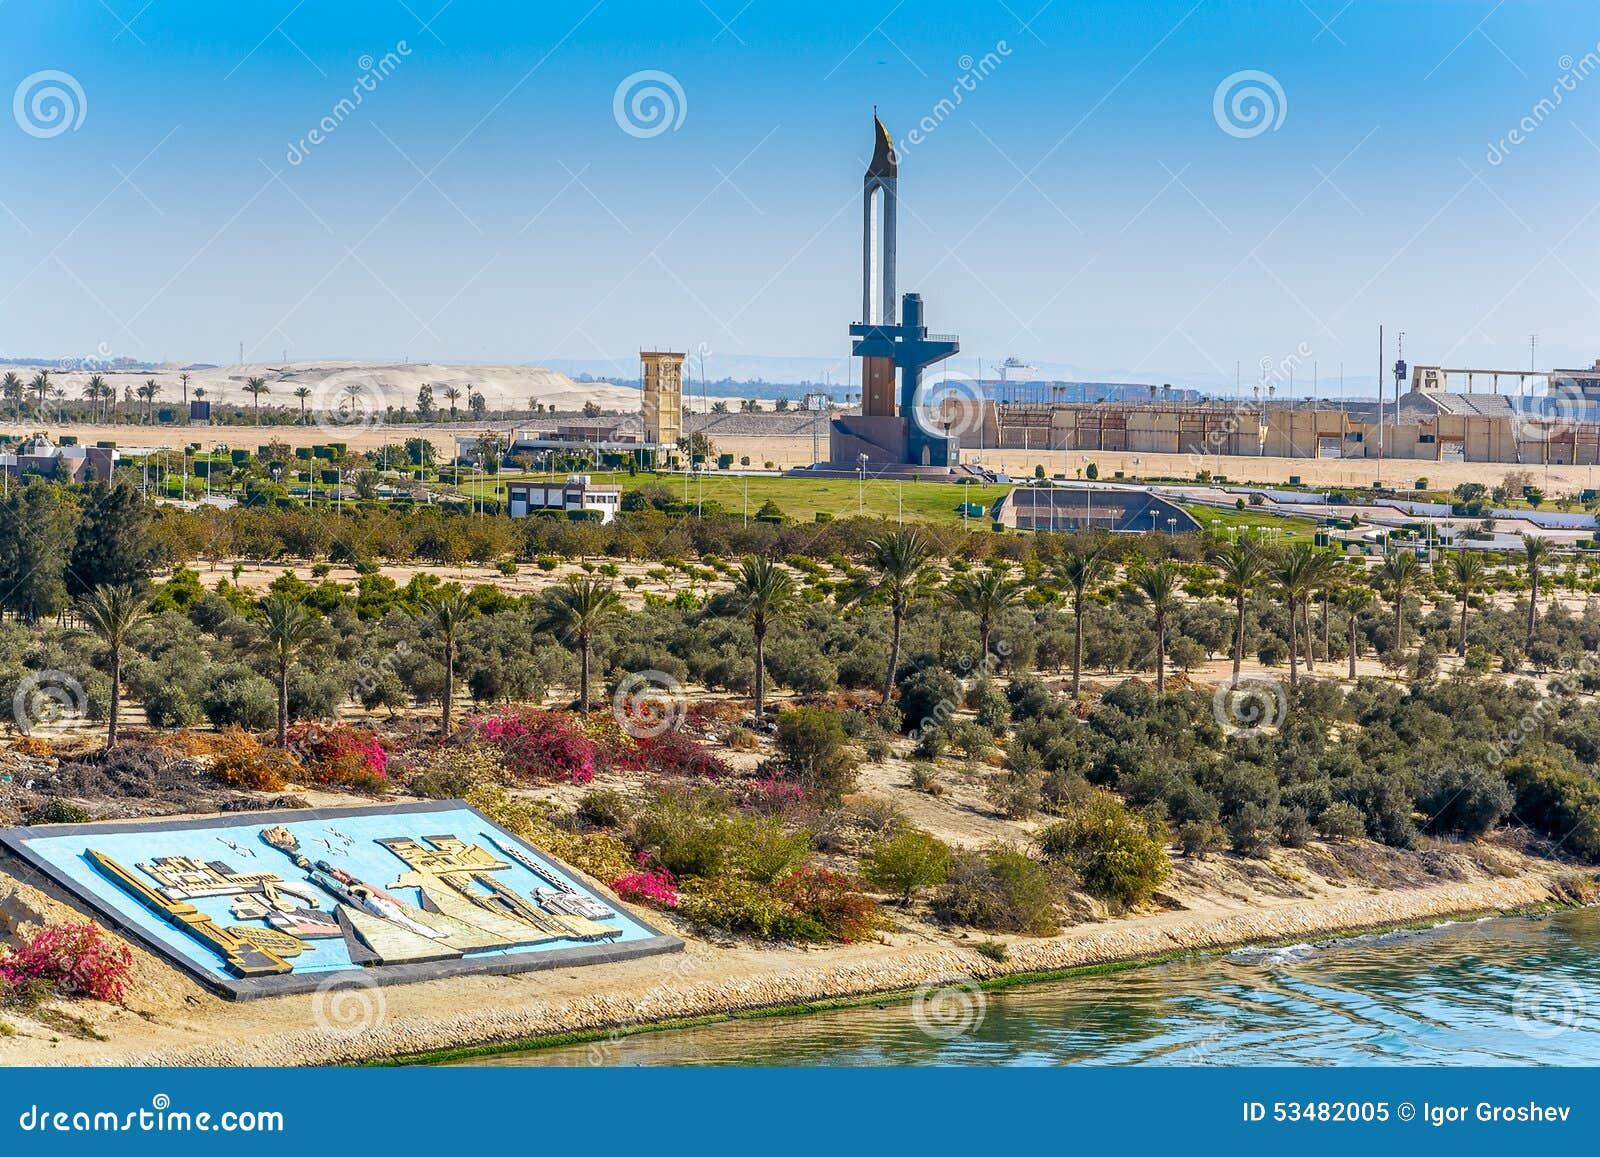 AK47 Bayonet memorial near Ismailia, Egypt